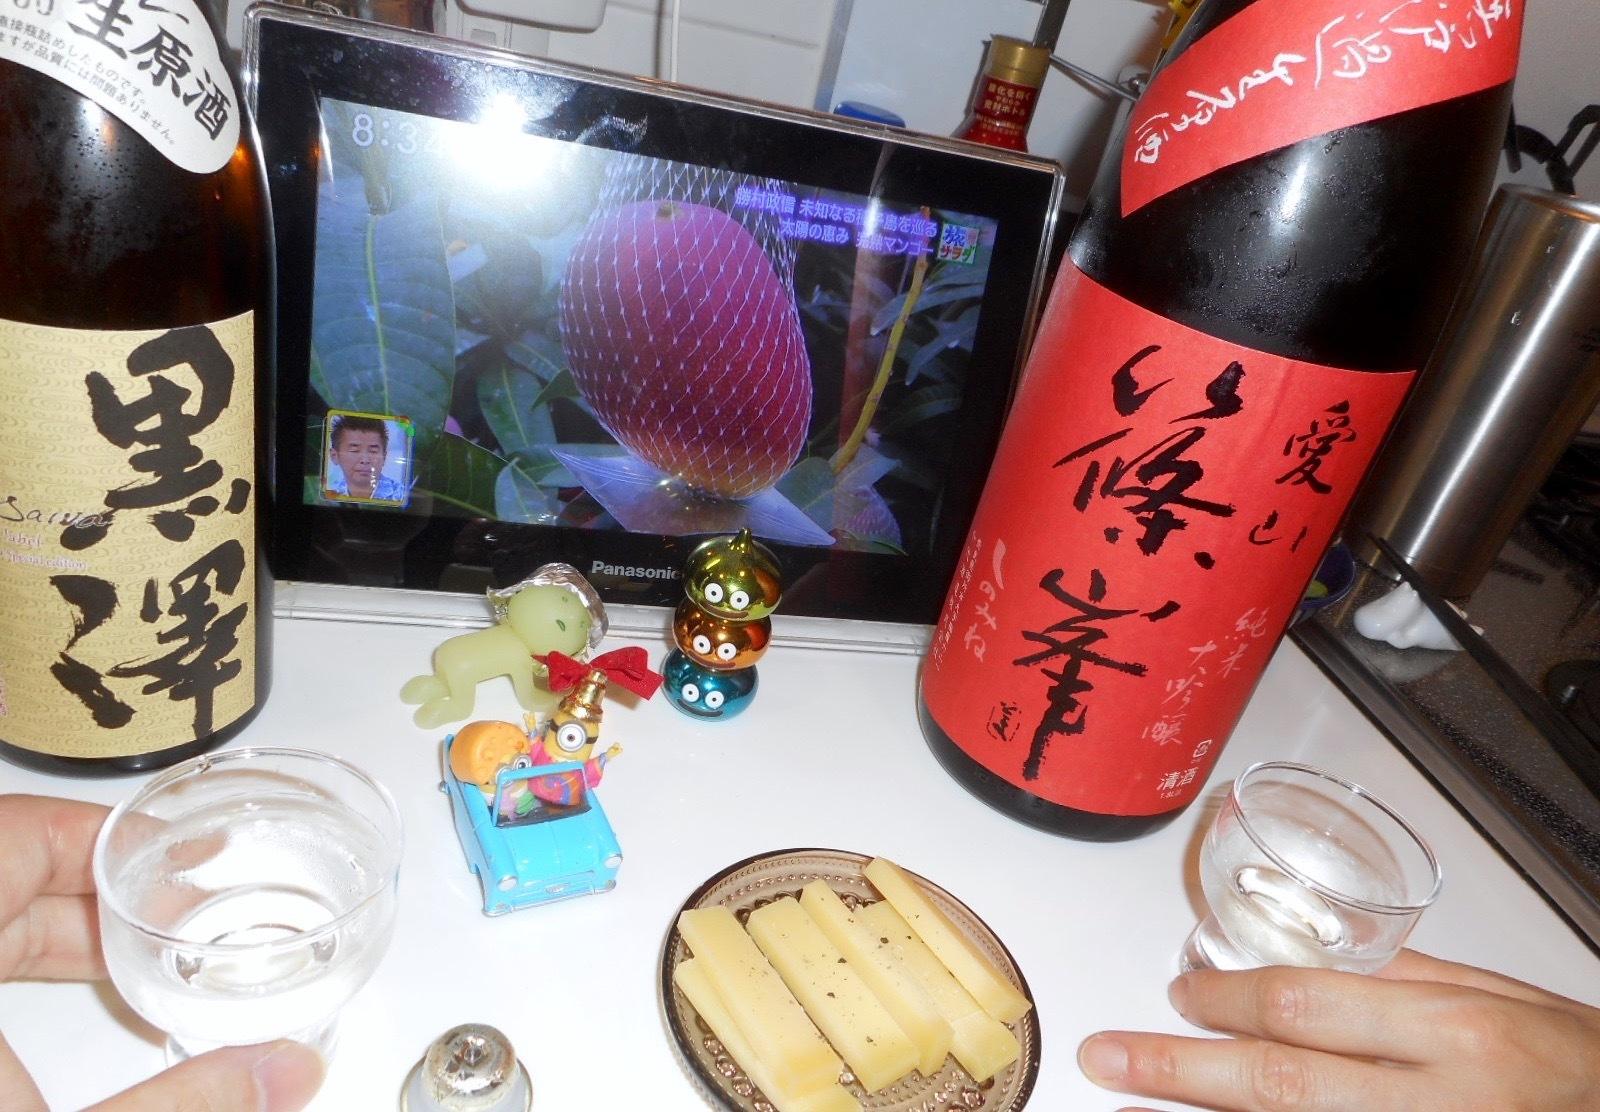 kurosawa_yellow29by2_8.jpg